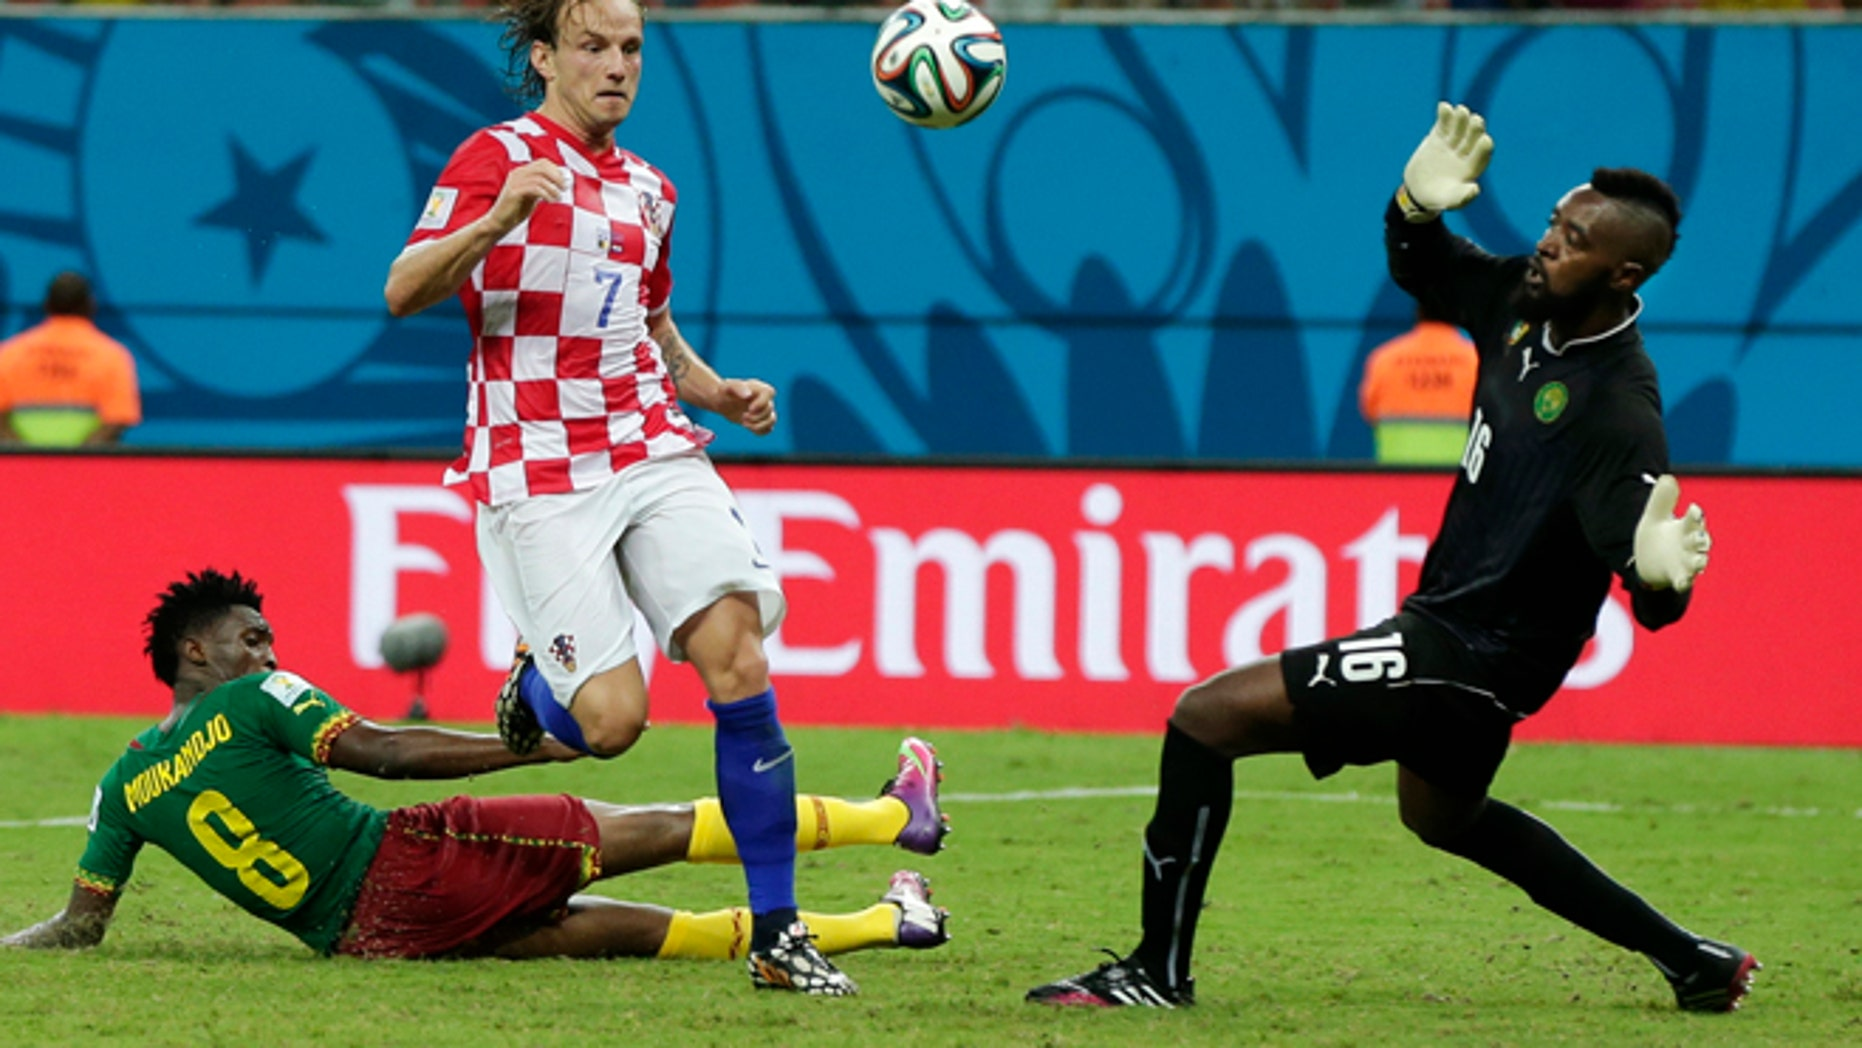 June 18, 2014: Croatia's Ivan Rakitic (7) kicks against Cameroon's goalkeeper Charles Itandje (16) during the group A World Cup soccer match between Cameroon and Croatia at the Arena da Amazonia in Manaus, Brazil.